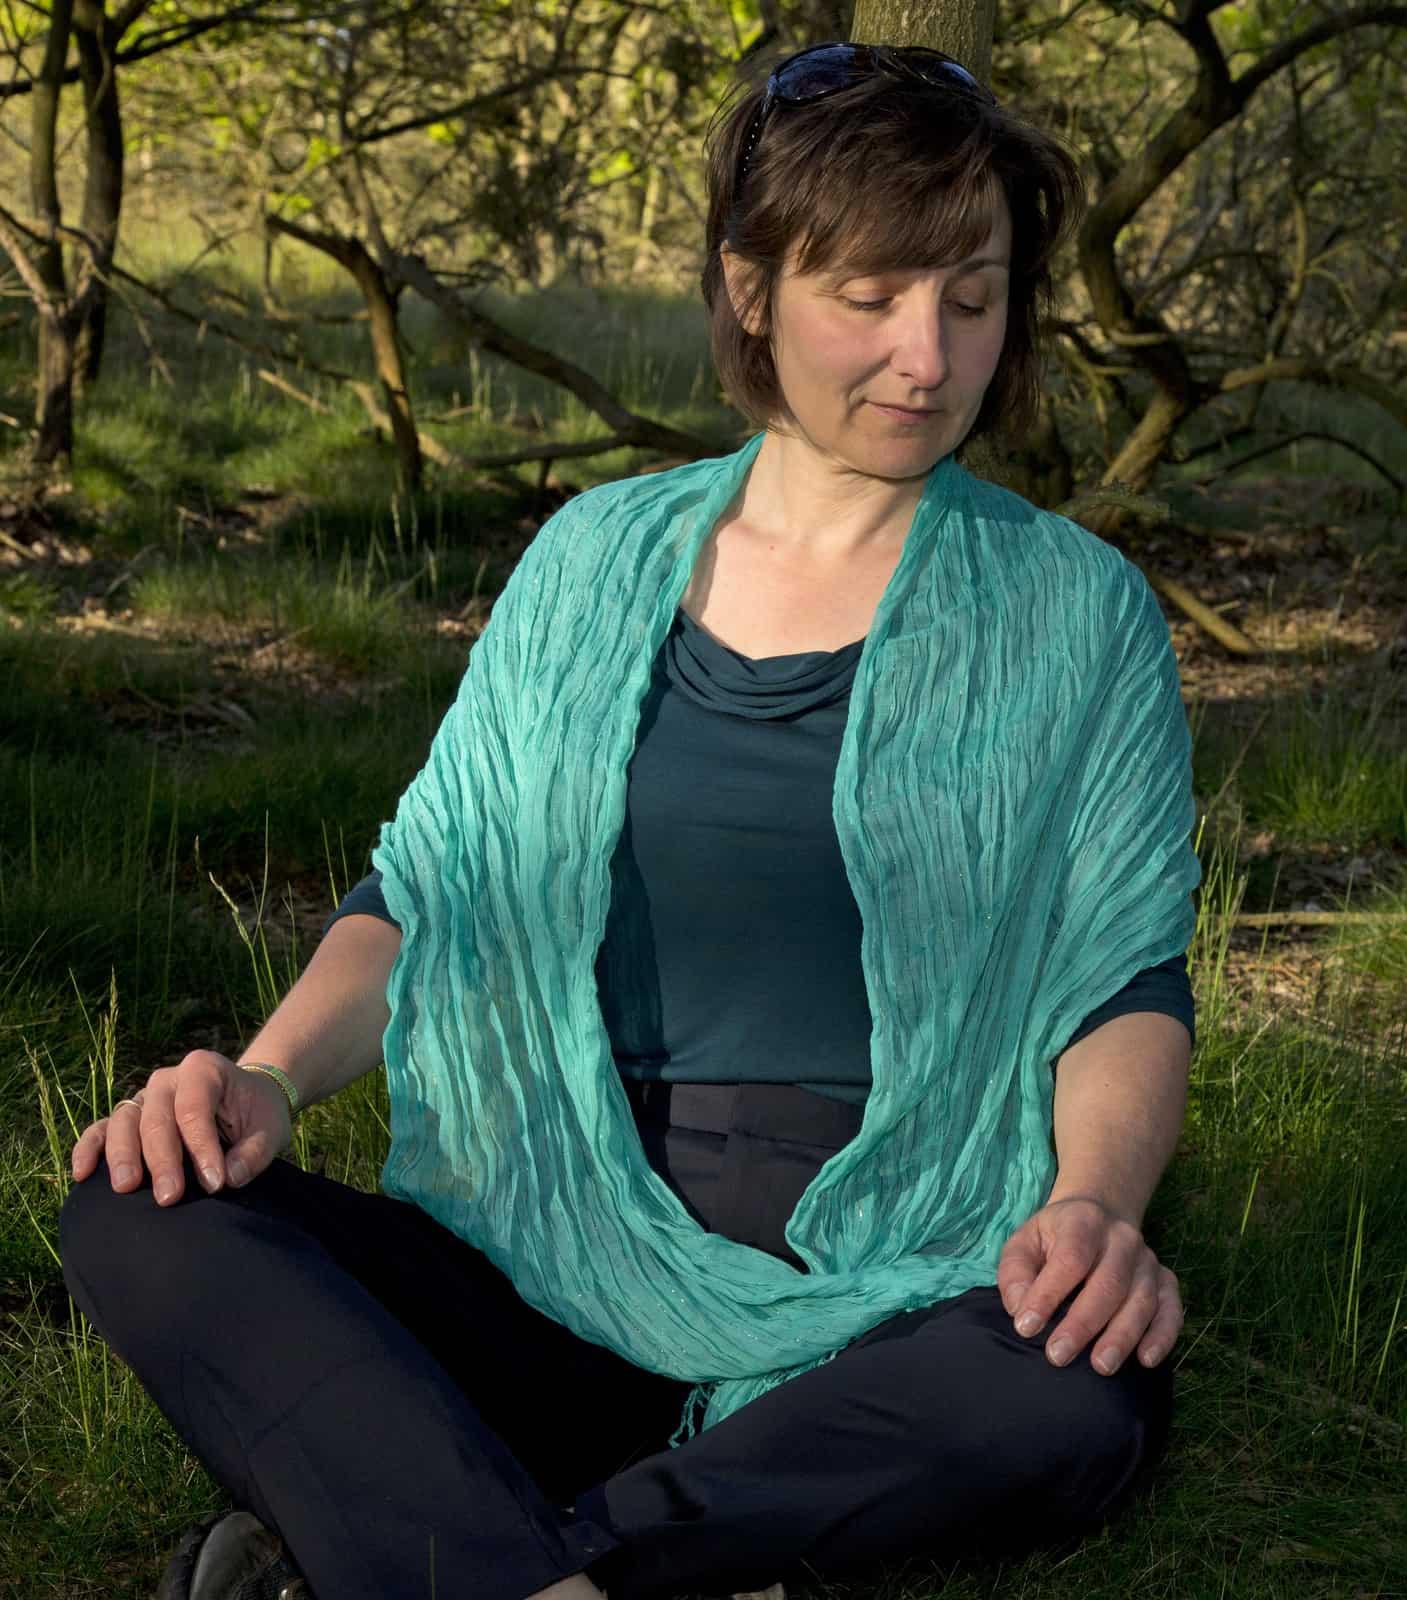 About Annya Stoddart and Wisdom Mind * Wisdom Mind